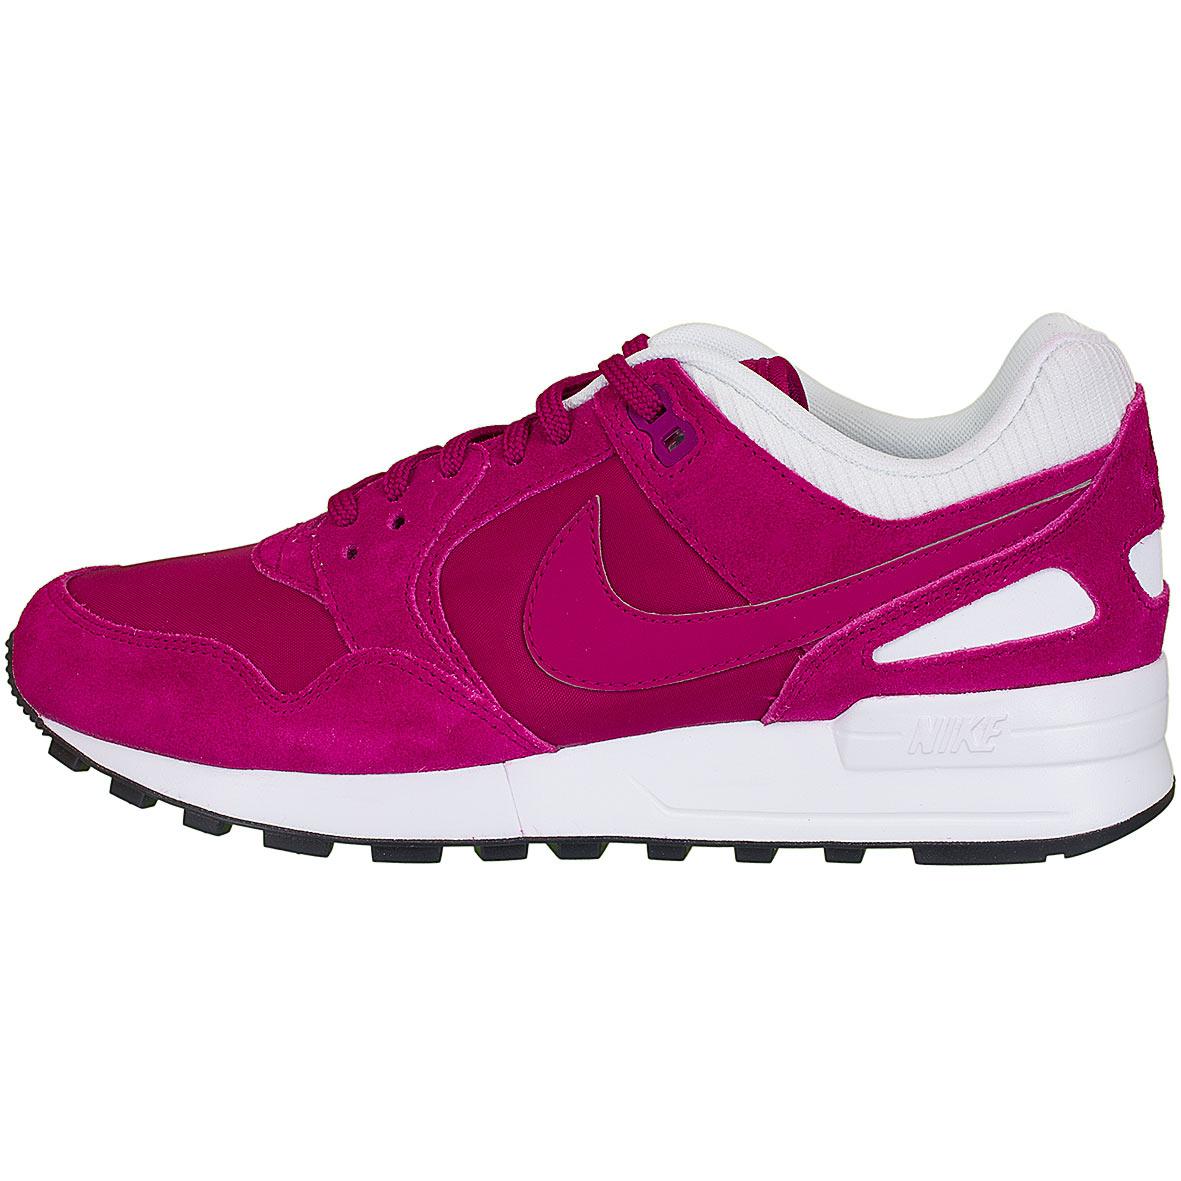 ´89 fuchsia Pegasus Sneaker Air Damen Nike 3jqR54LA